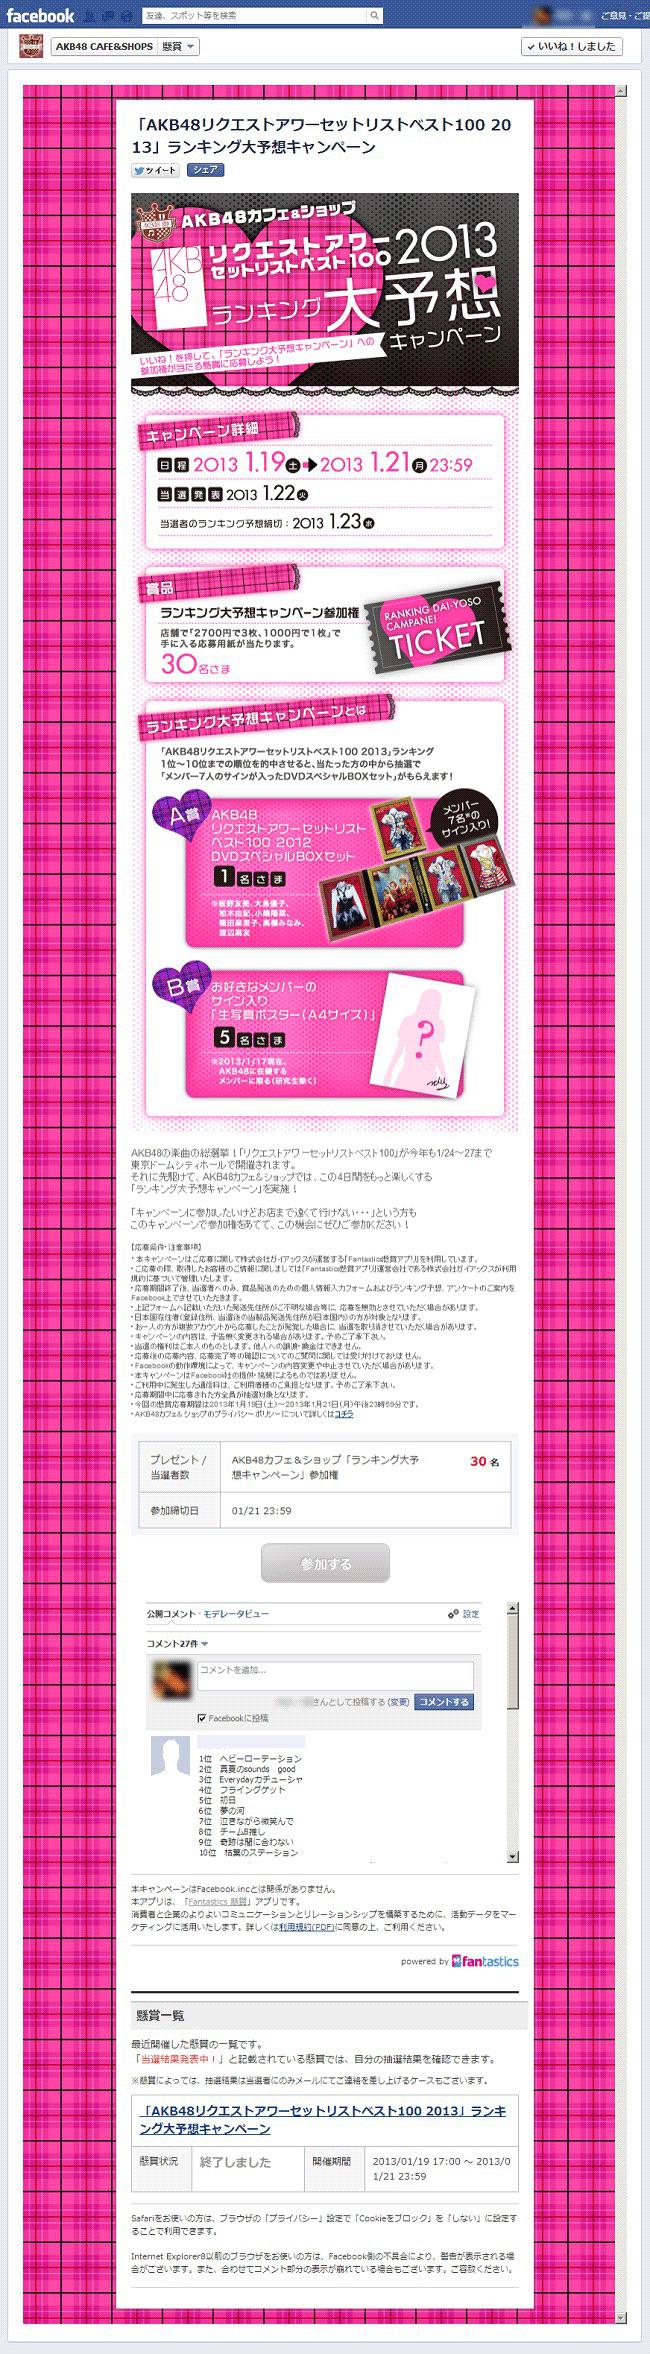 Fantastics 懸賞キャンペーンアプリ(AKB48 CAFE様)